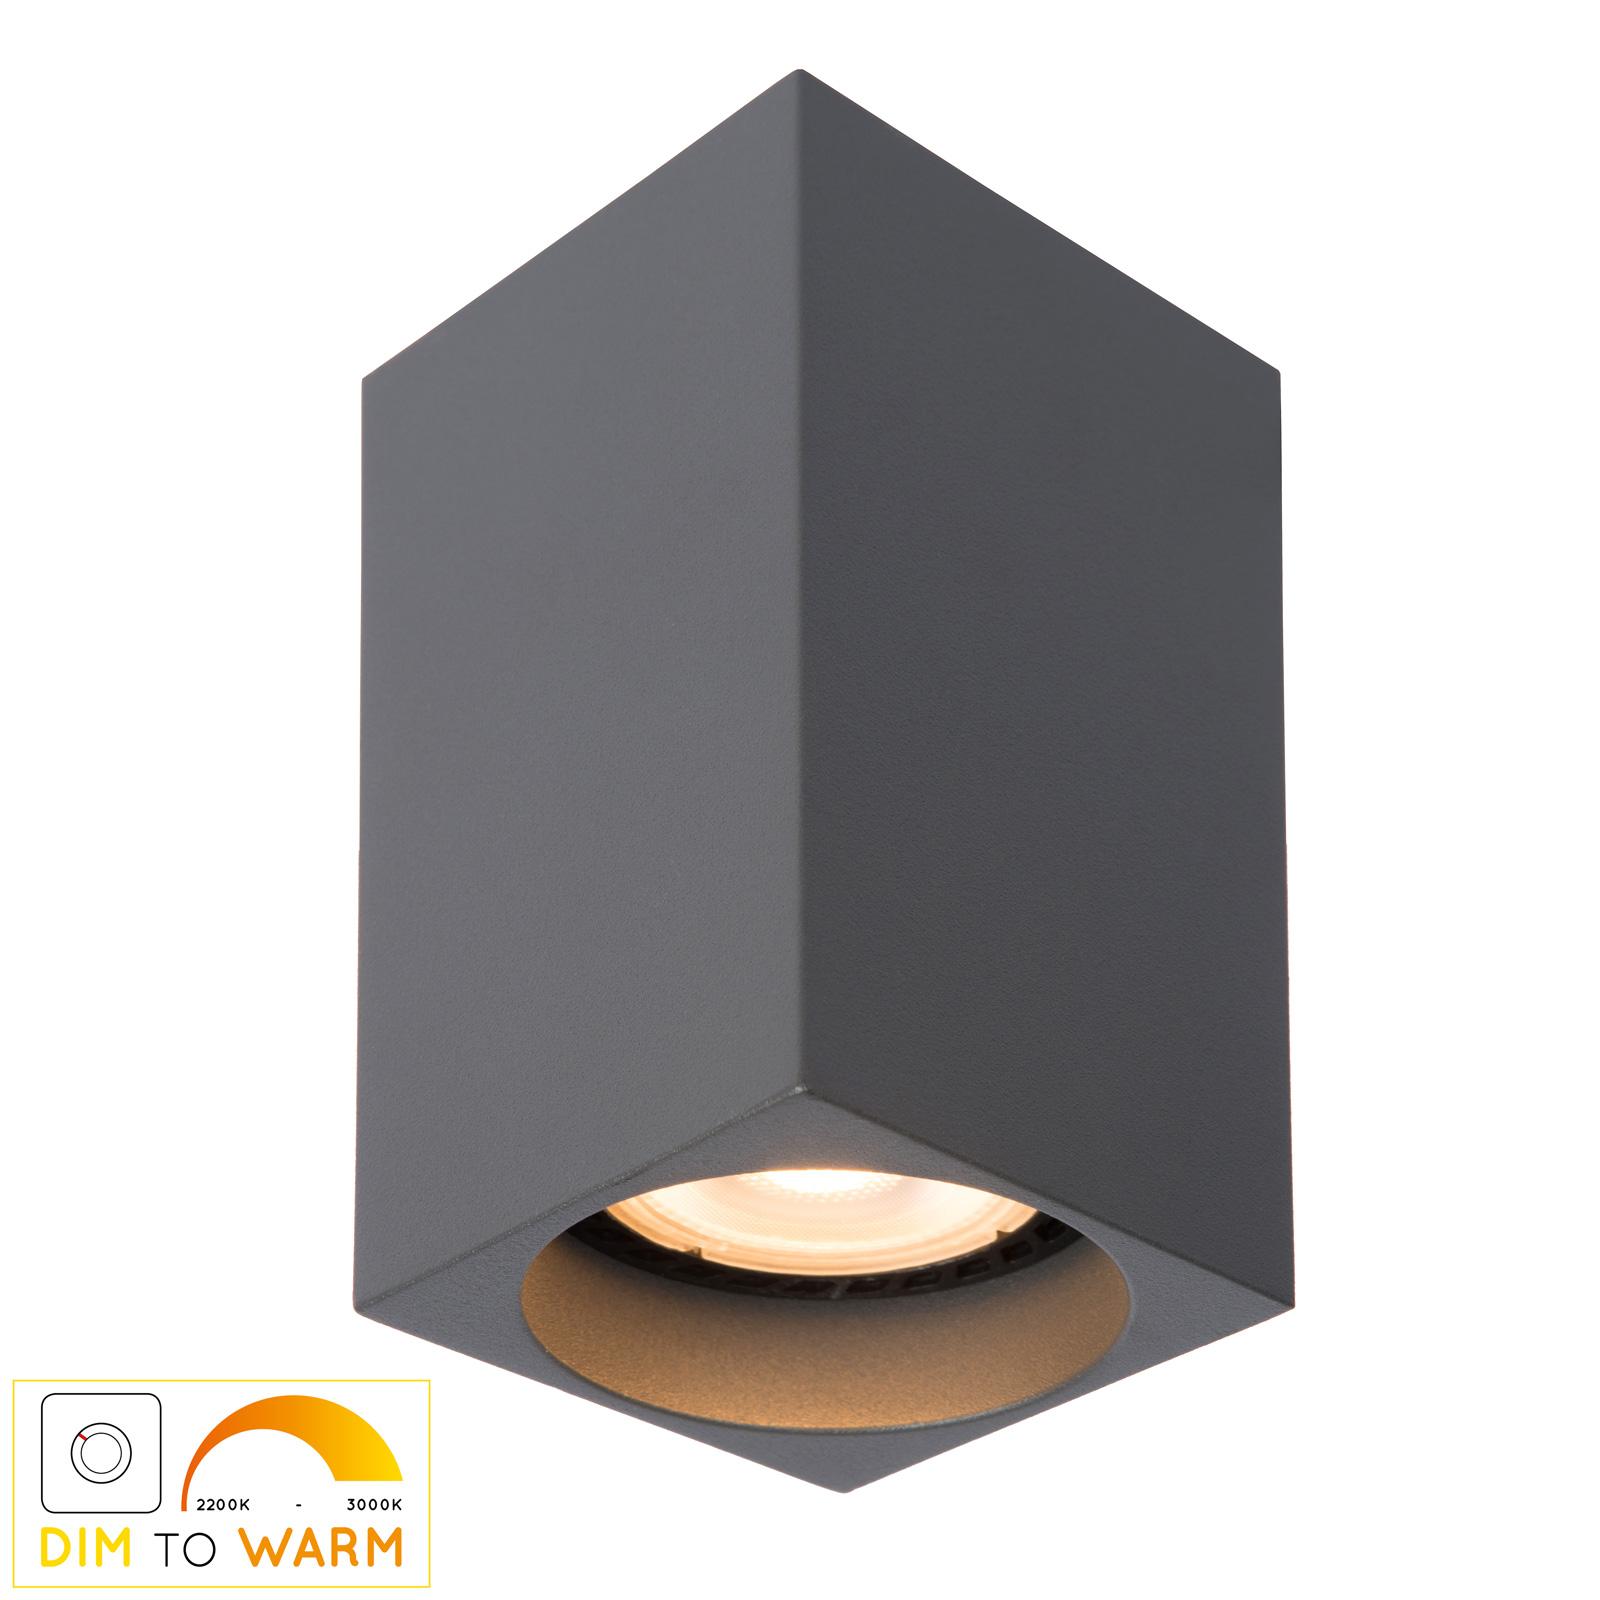 LED plafondlamp Delto dim to warm, hoekig, grijs